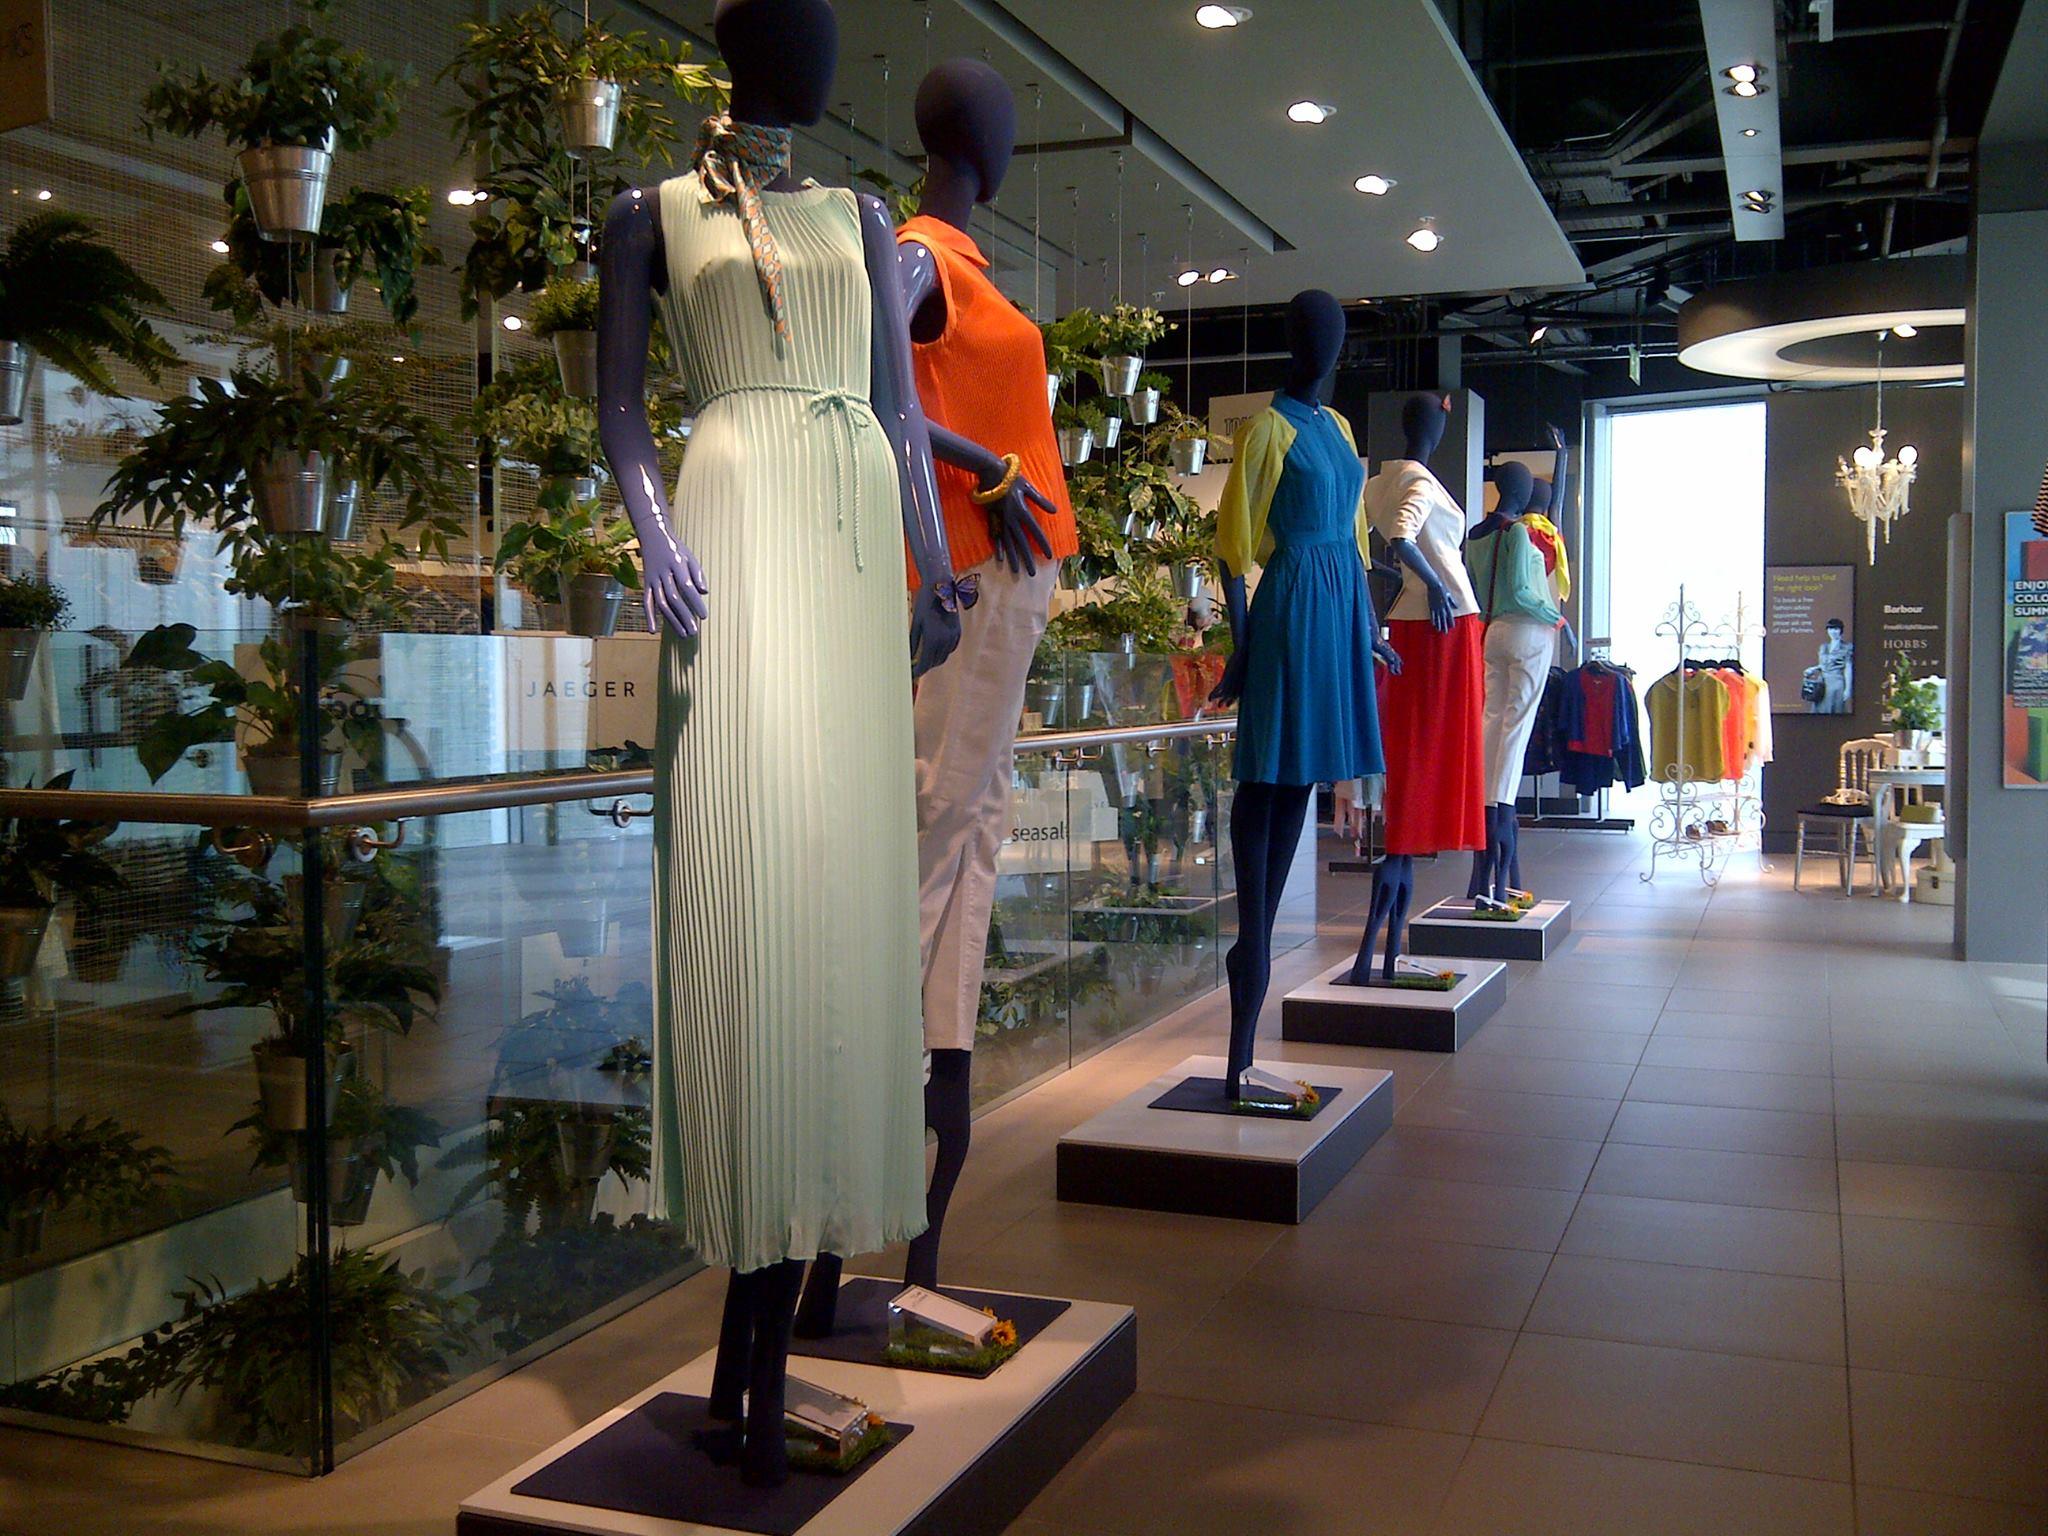 john-lewis-hybrid-store-exeter-internet-mannequins